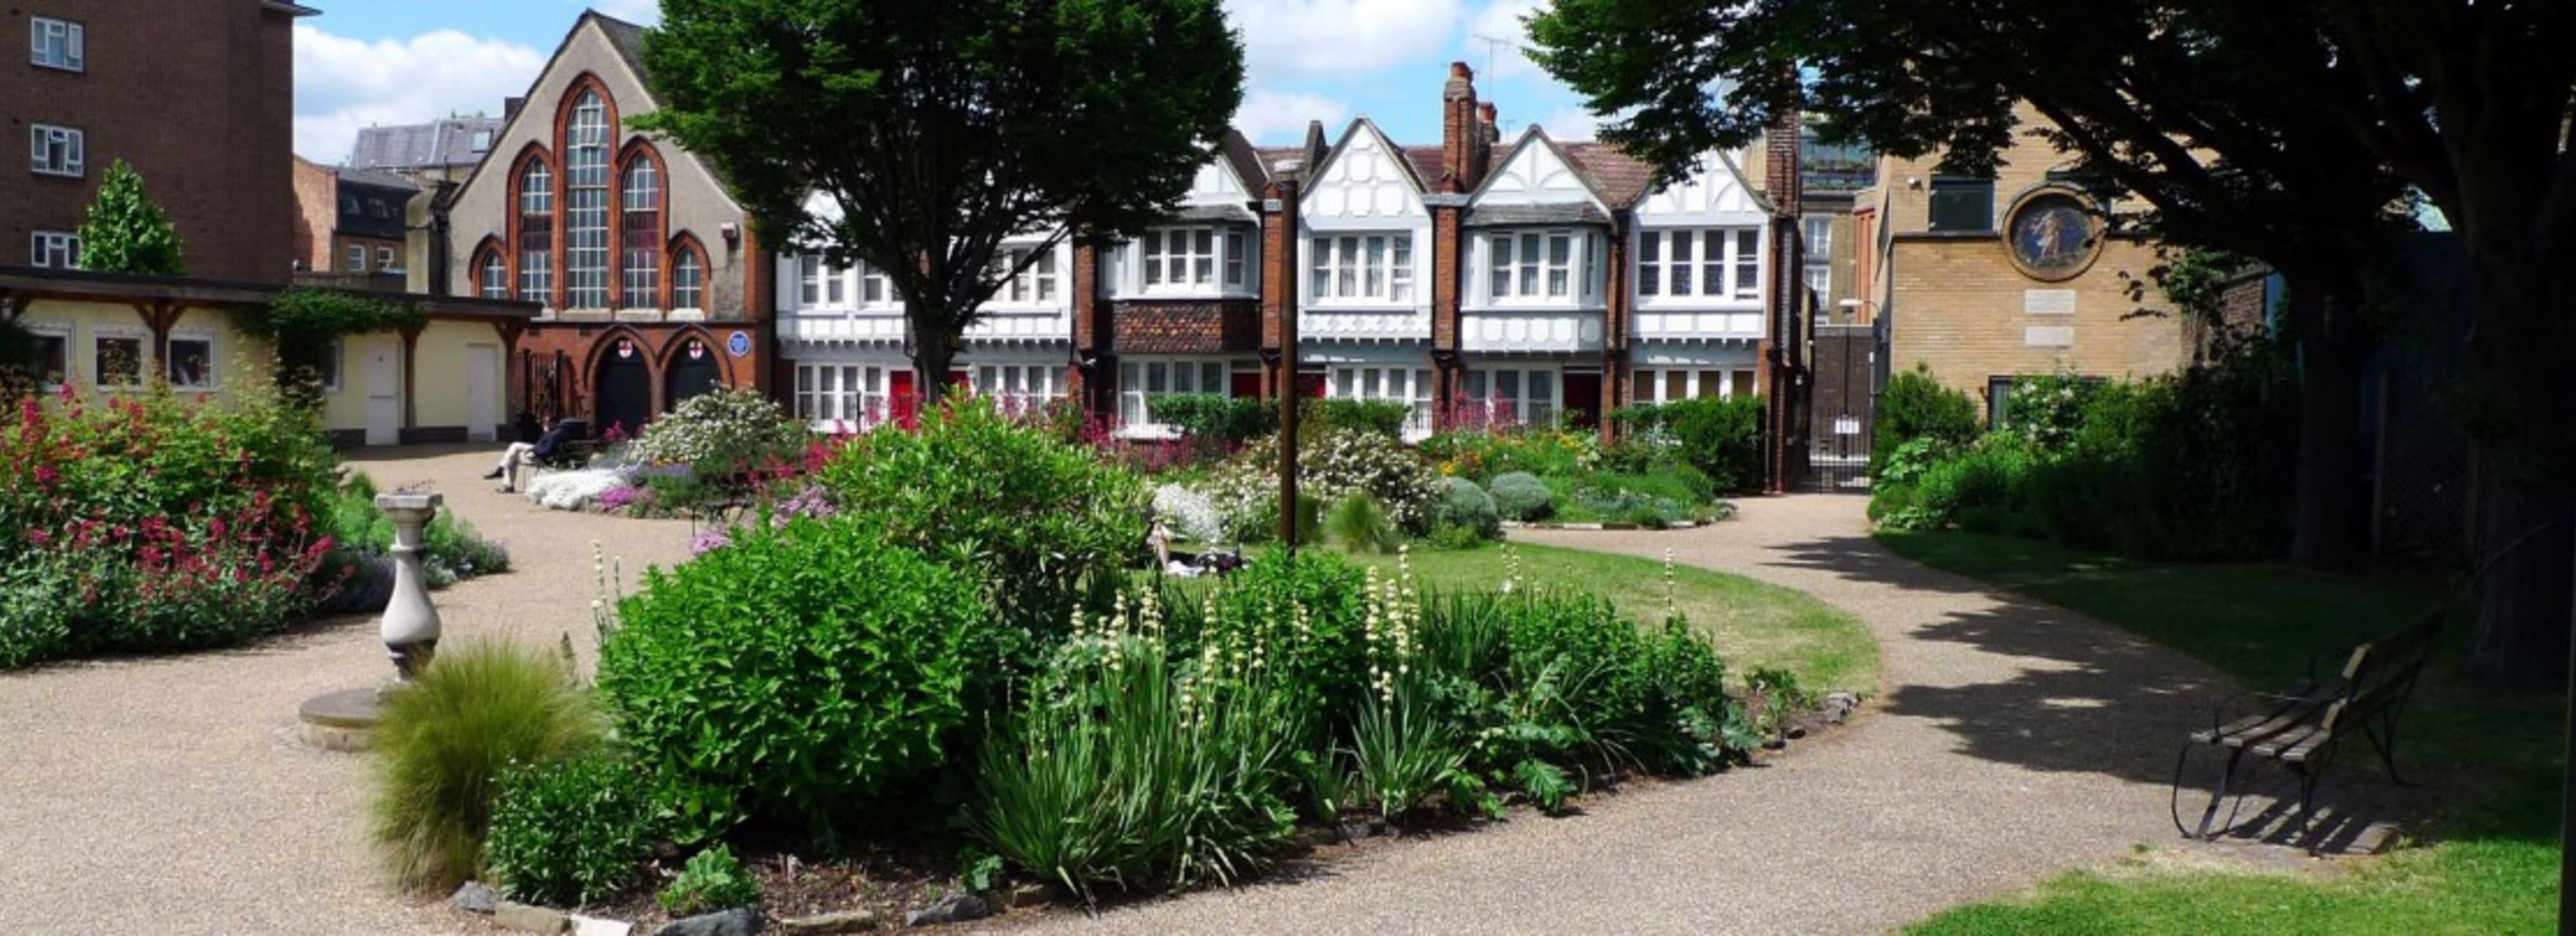 London - Borough's backstreets